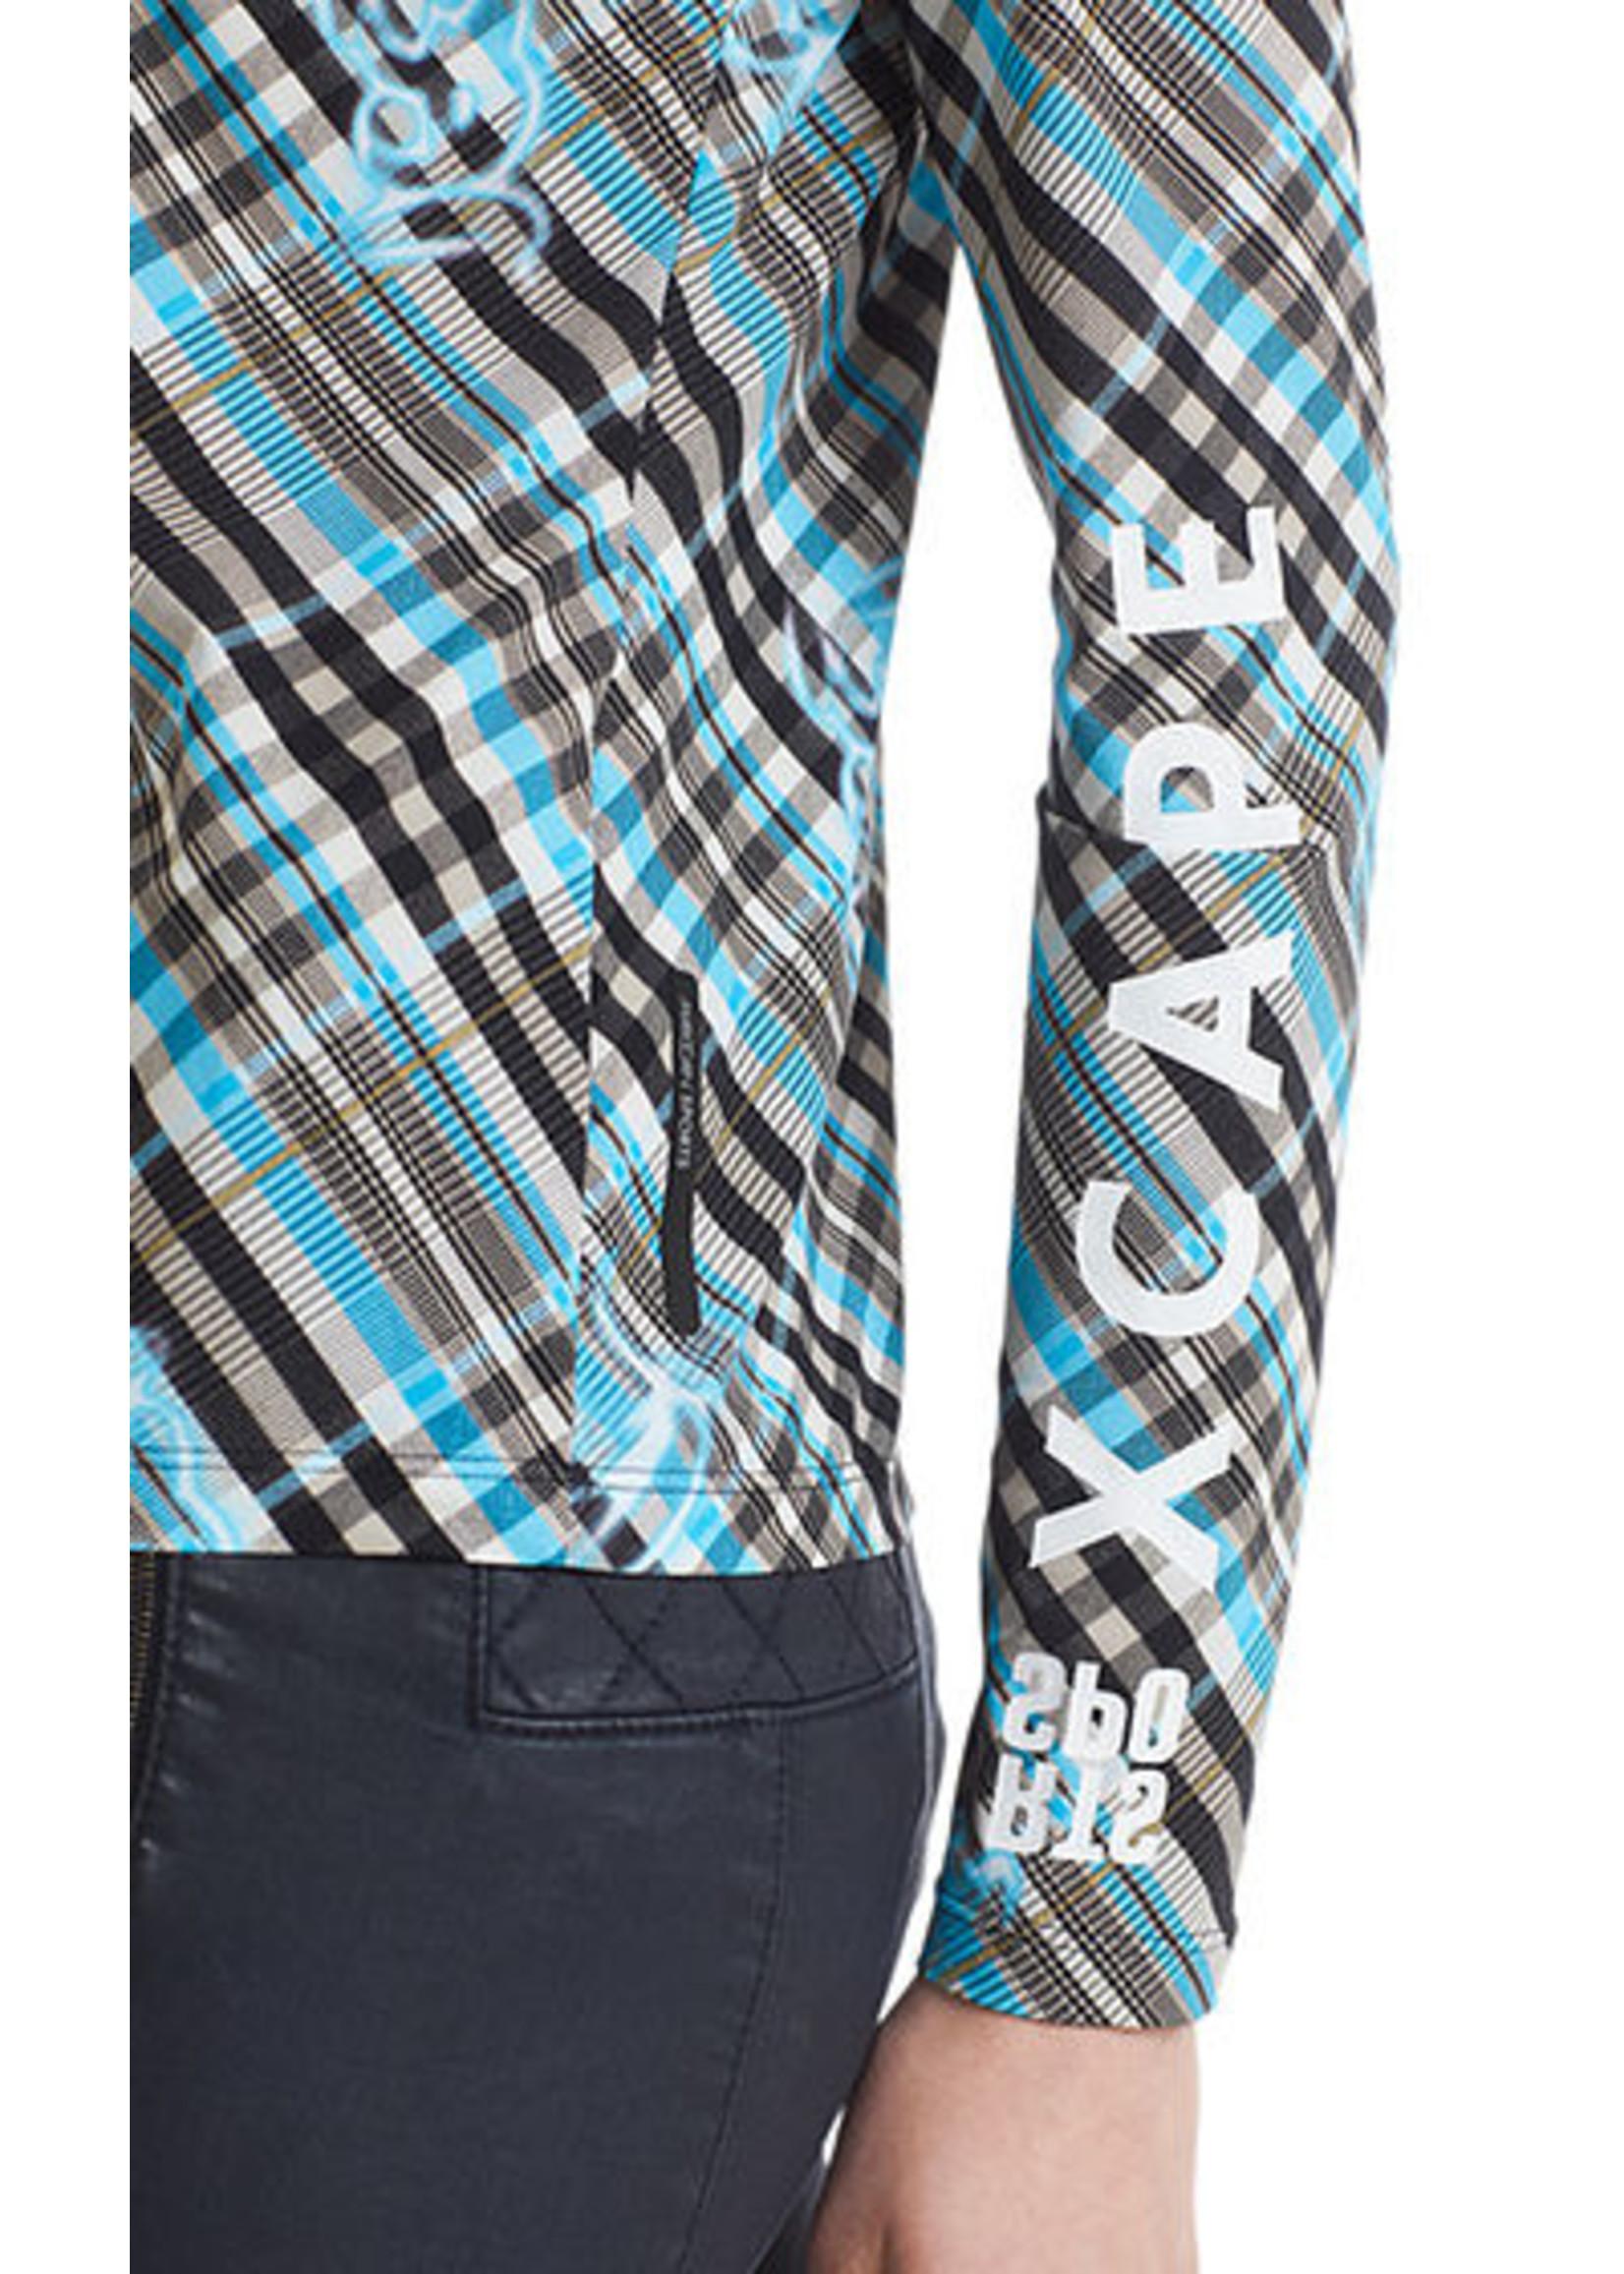 Marccain Sports T-shirt RS 48.52 J09 scuba blue